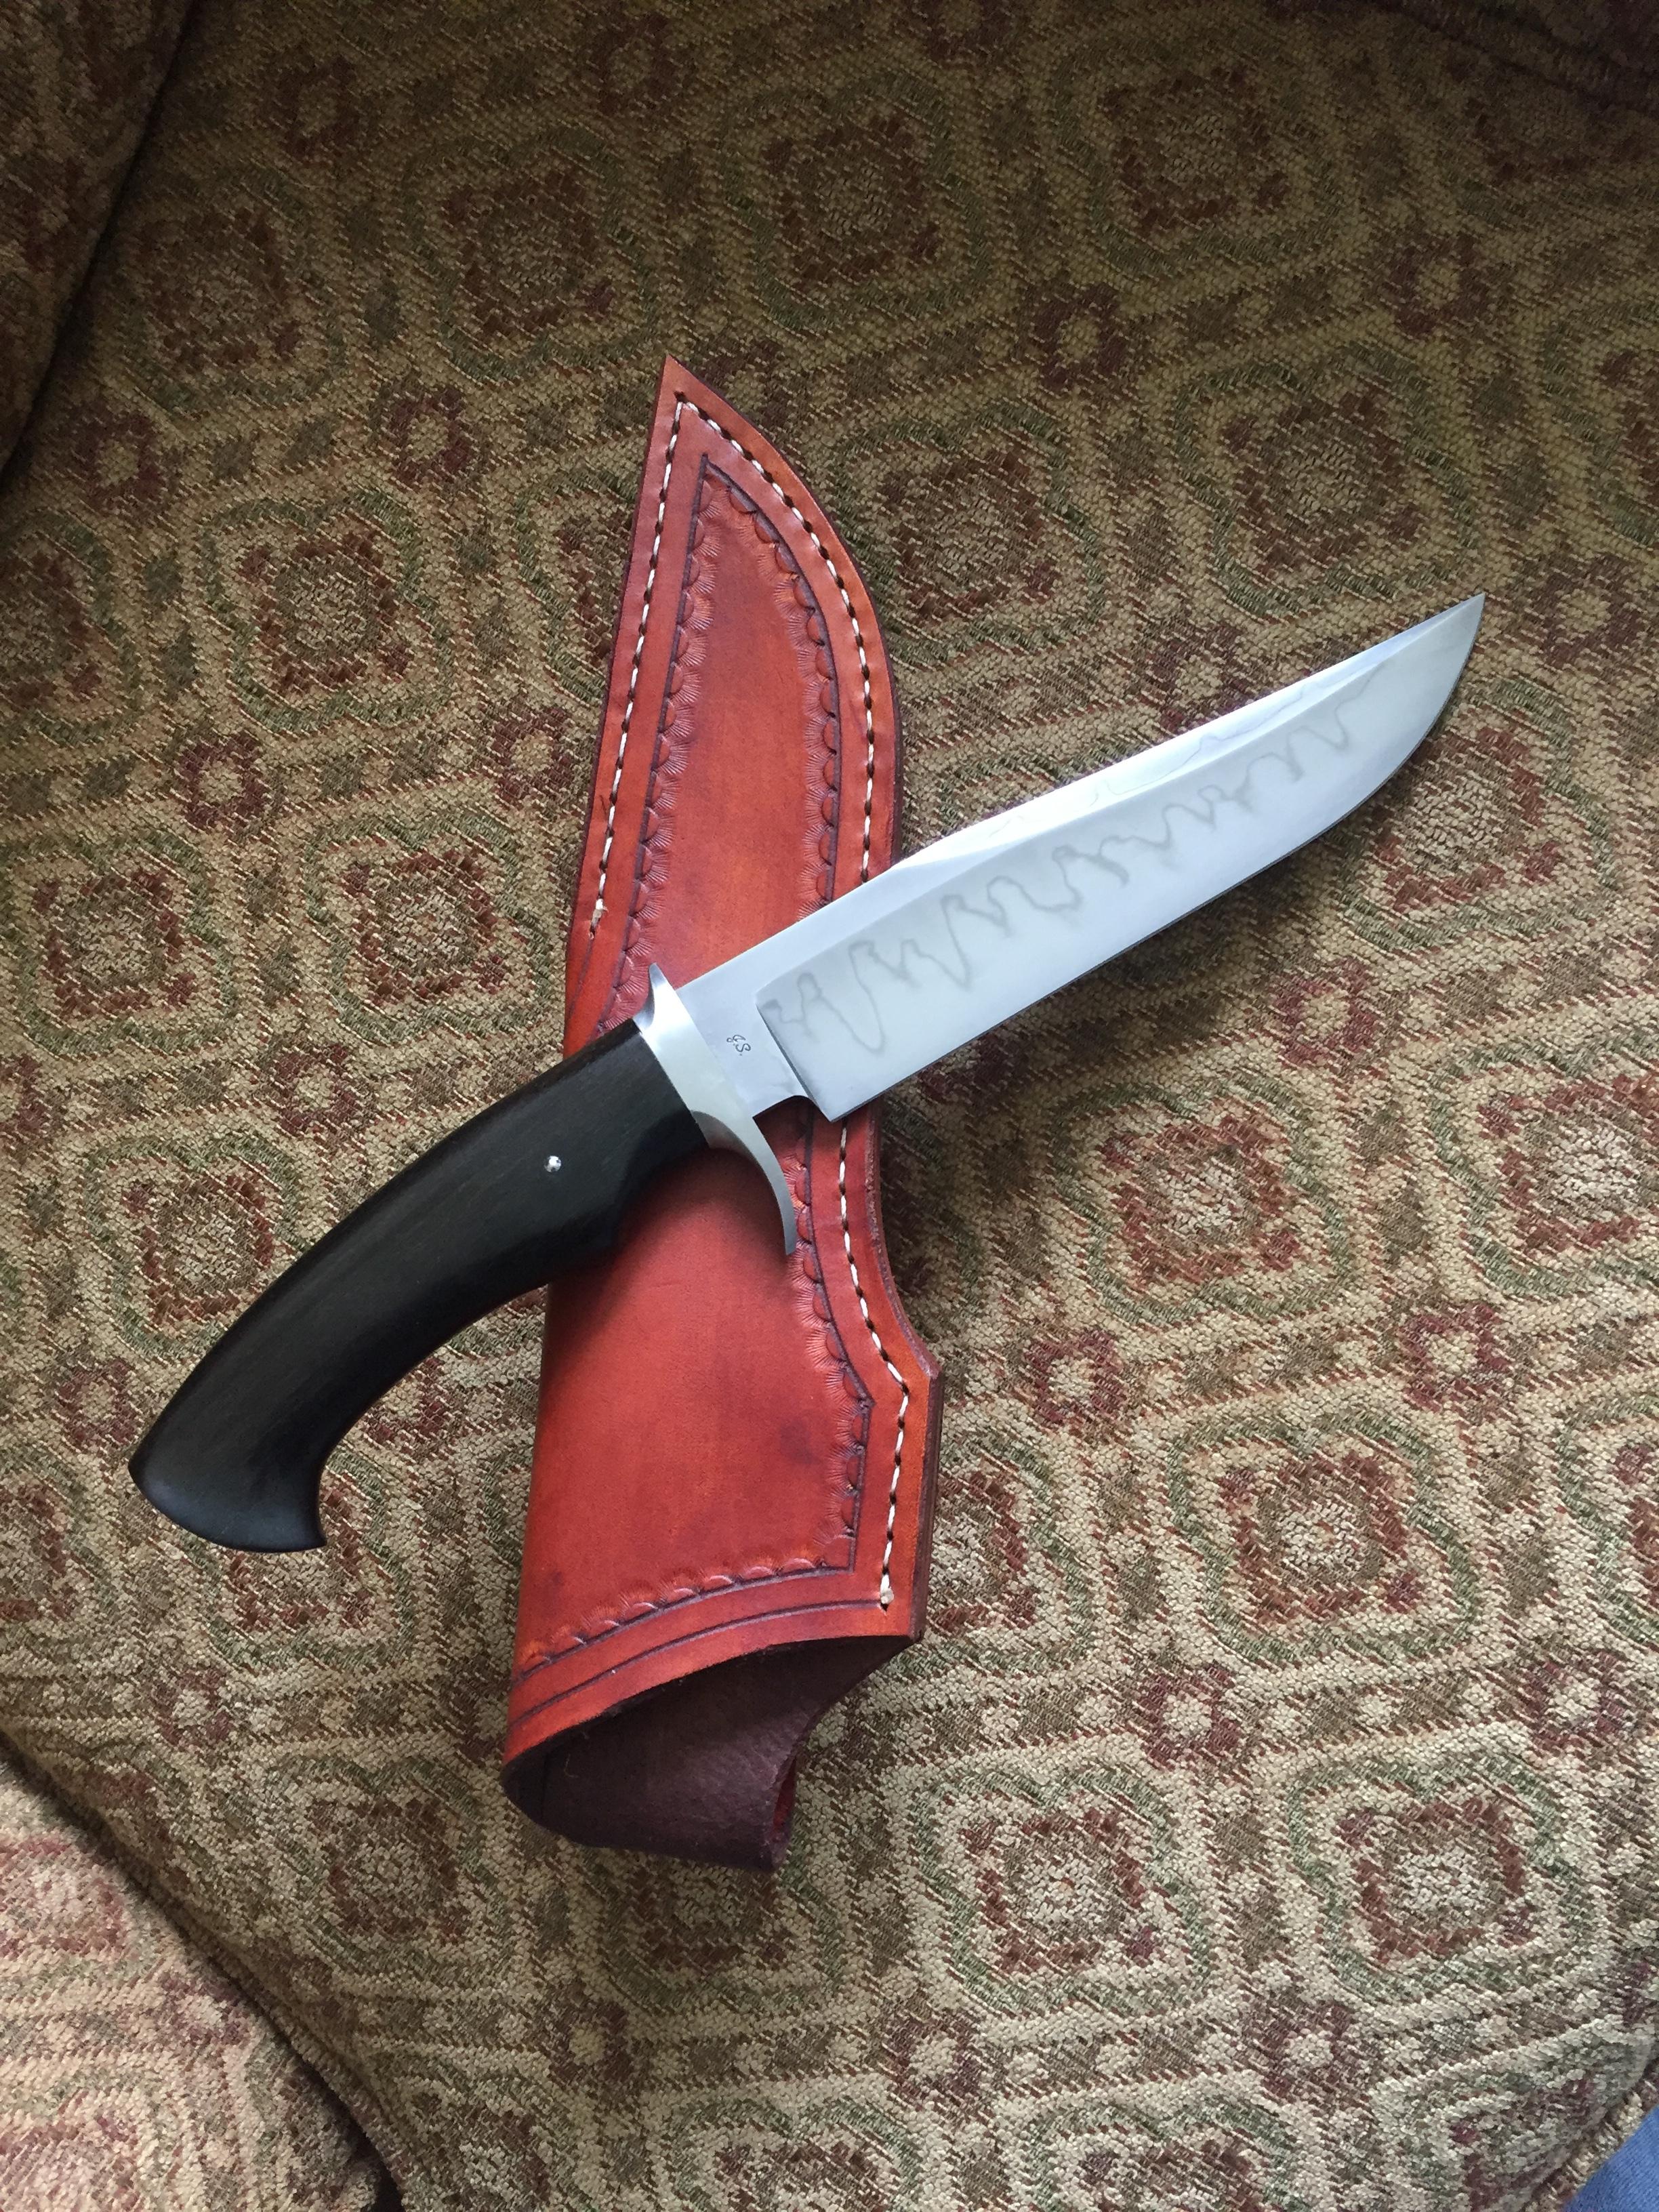 W2 steel with hamon, ebony handle with sheath